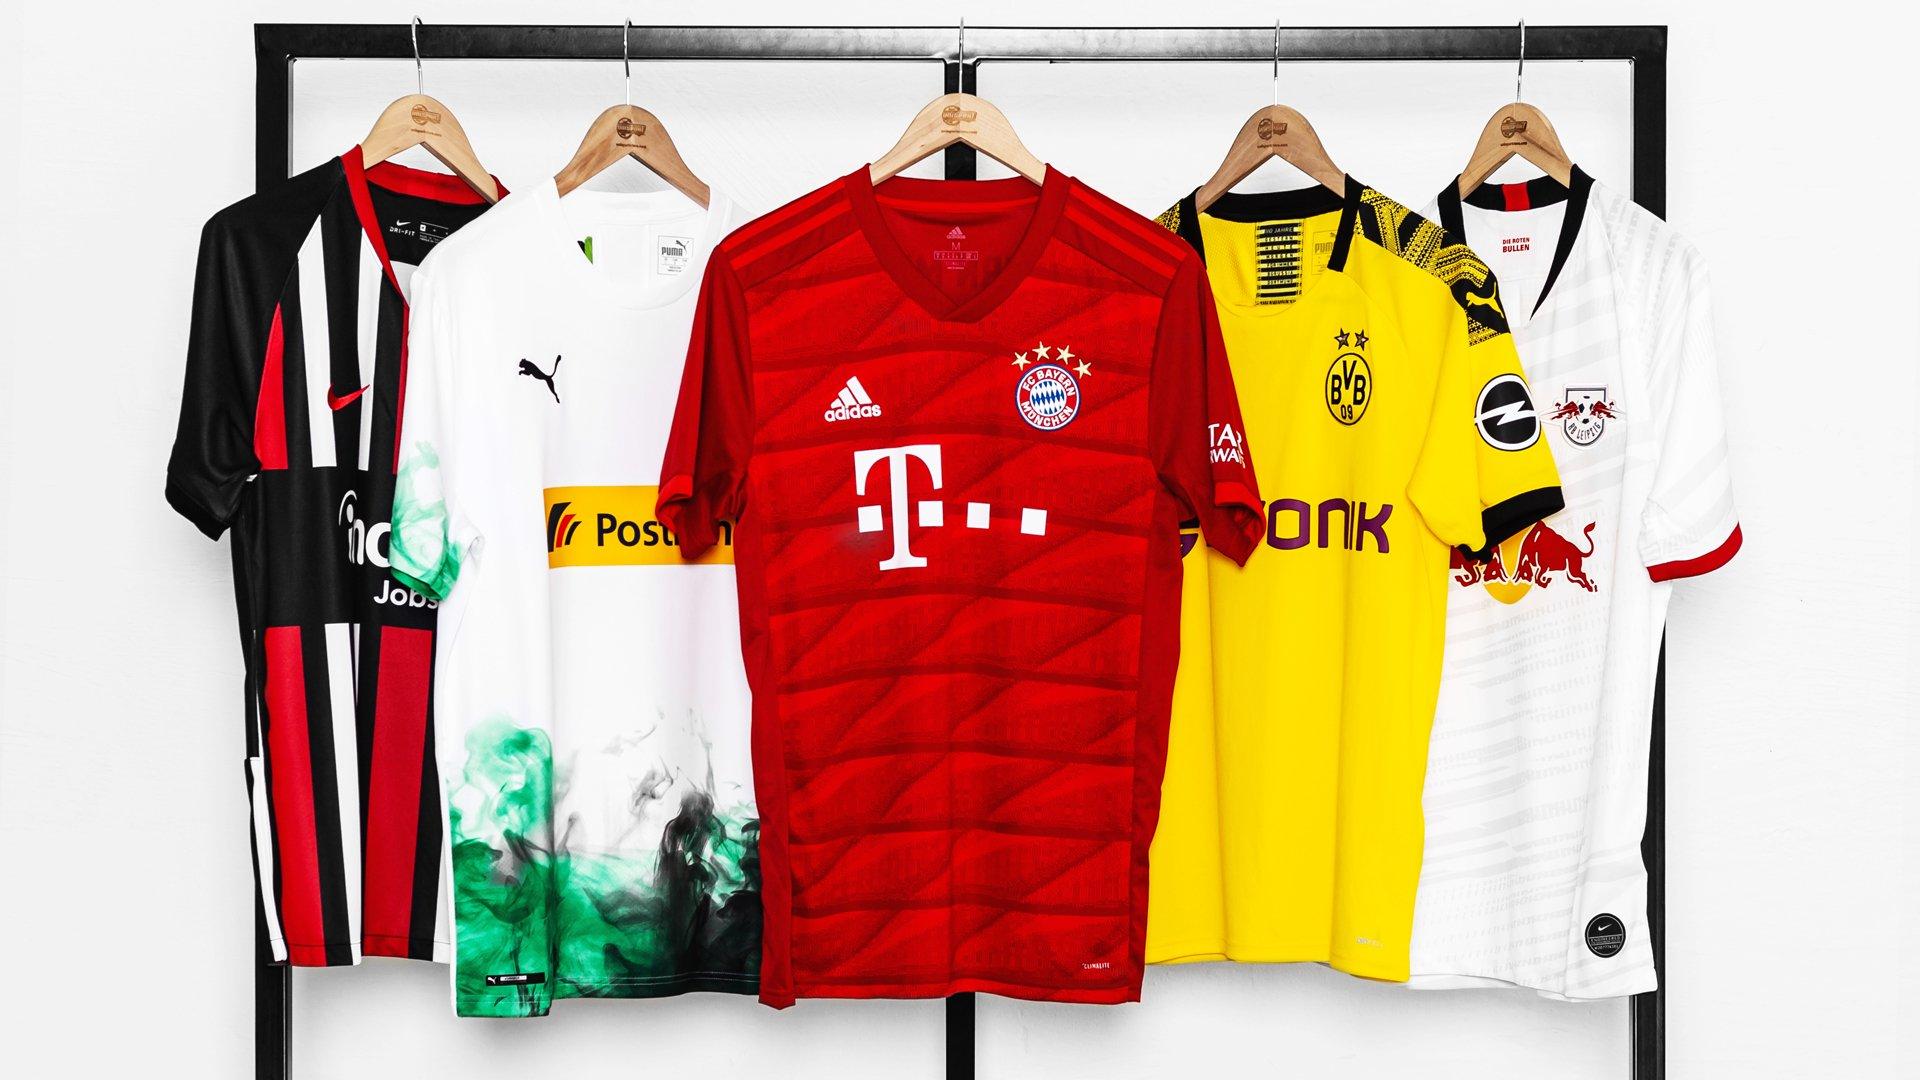 super popular 06edc 0b2d1 Bundesliga Trikots 2019/20 | Entdecke alle neuen Bundesliga ...